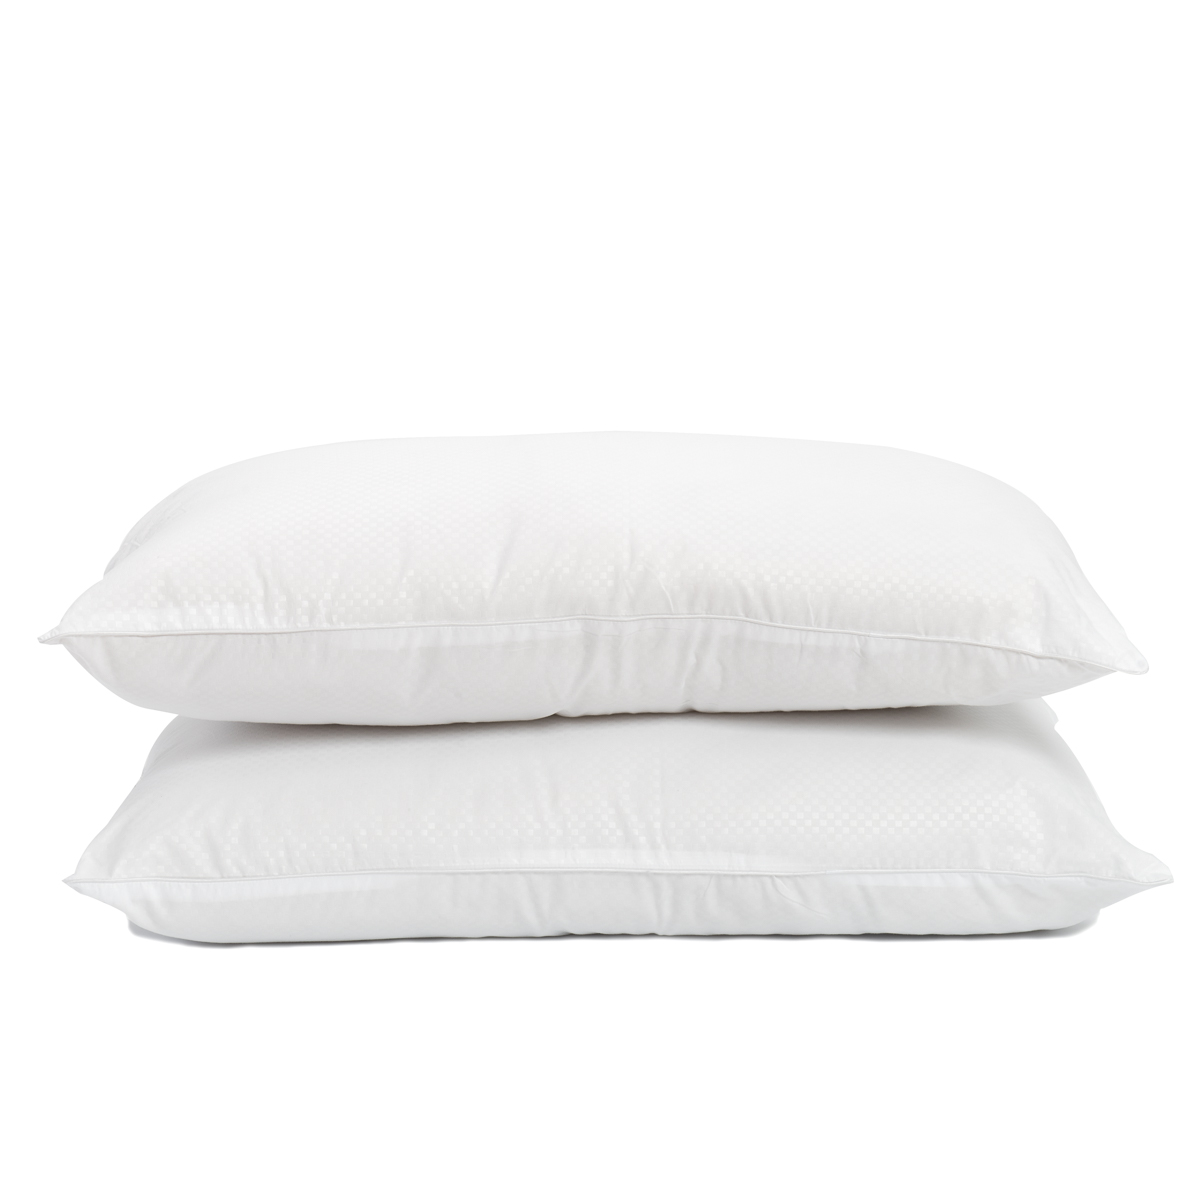 Caseys 5 Star Hotel Pillow 2 Pack